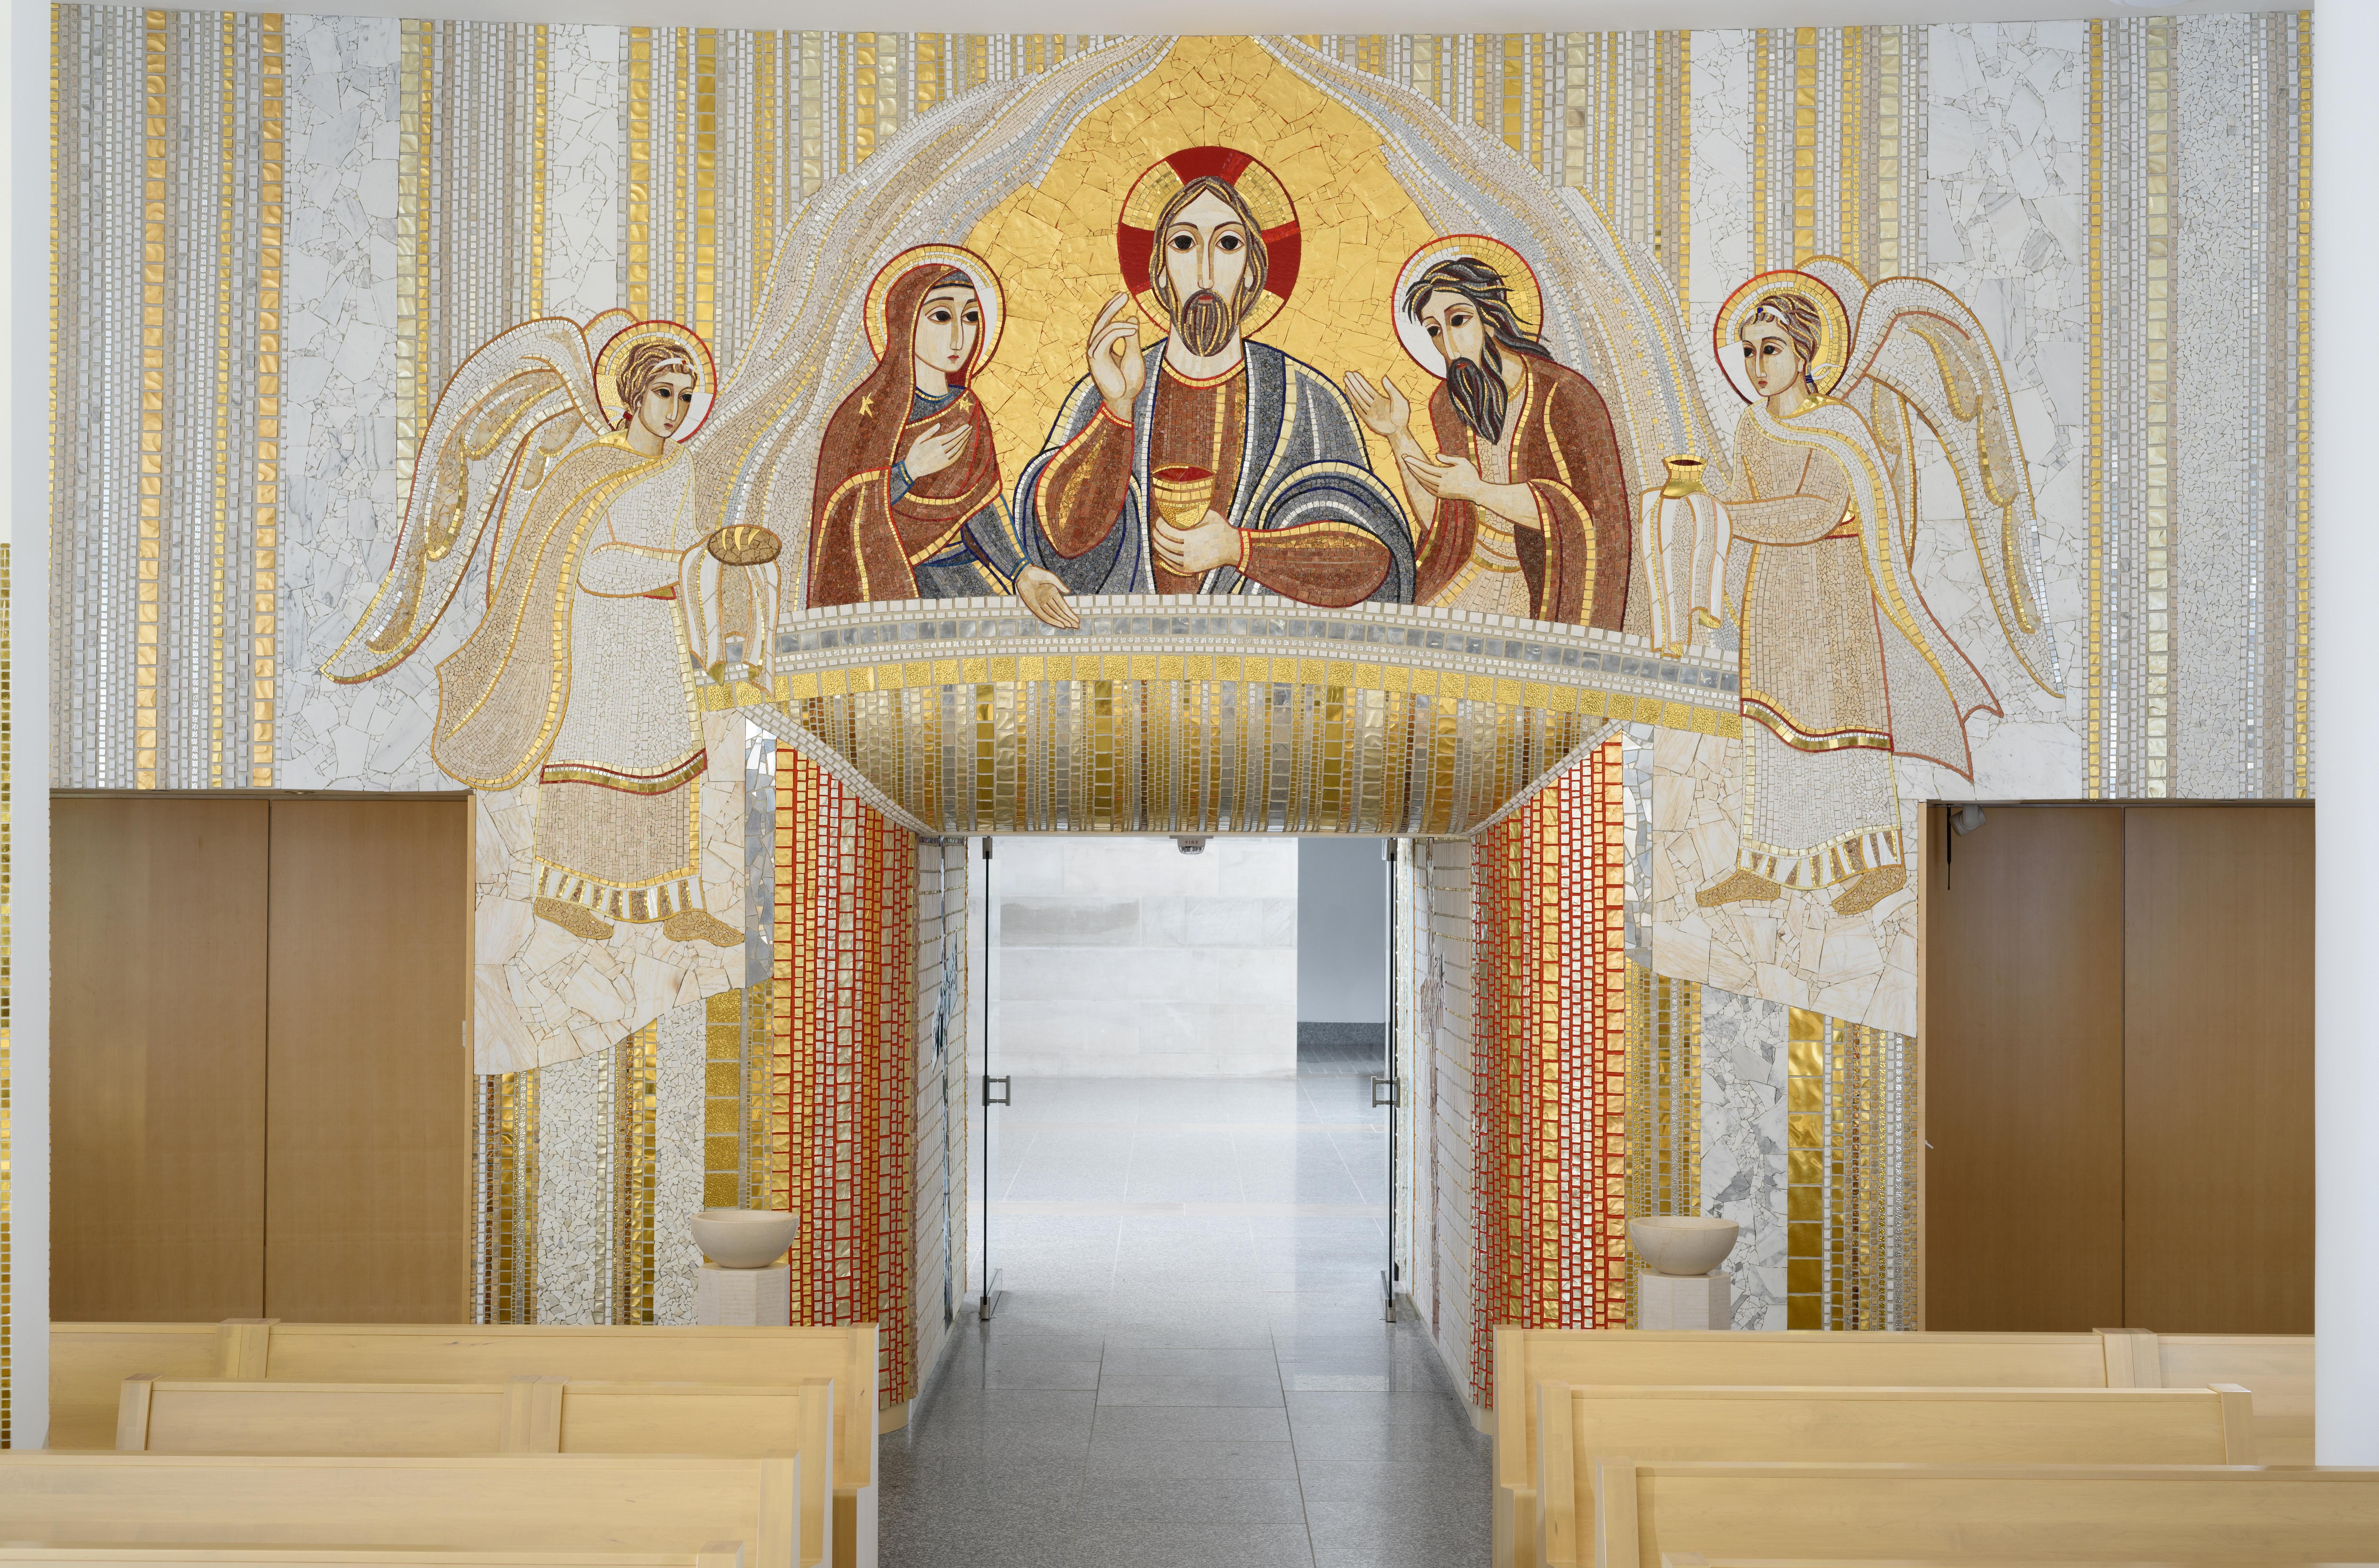 JPII shrine big chapel